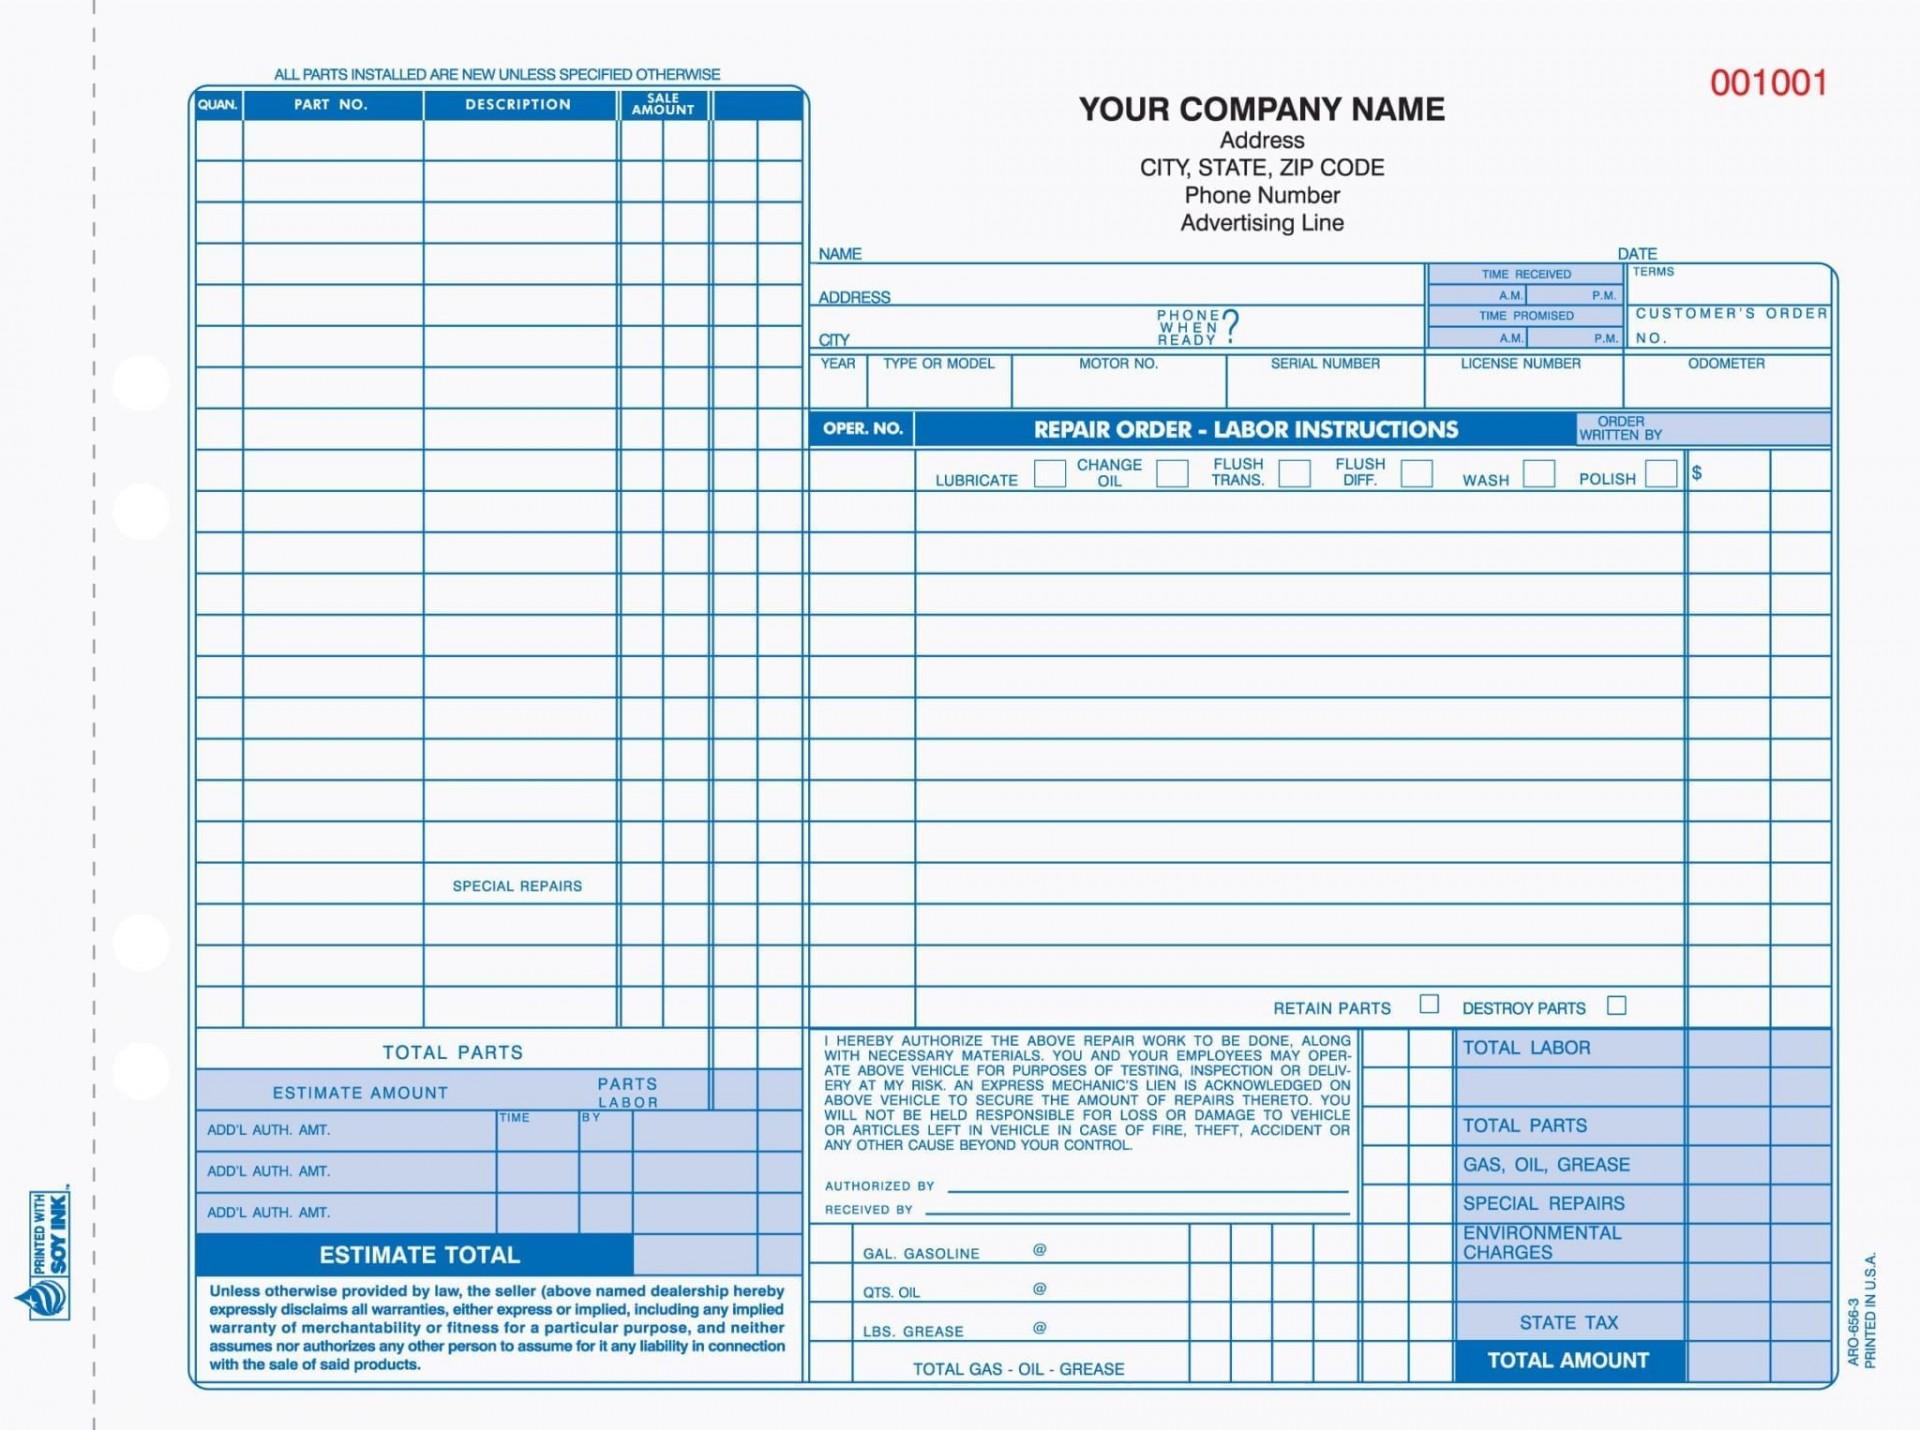 003 Magnificent Automotive Repair Invoice Template Sample  Free Auto Pdf Car Form1920